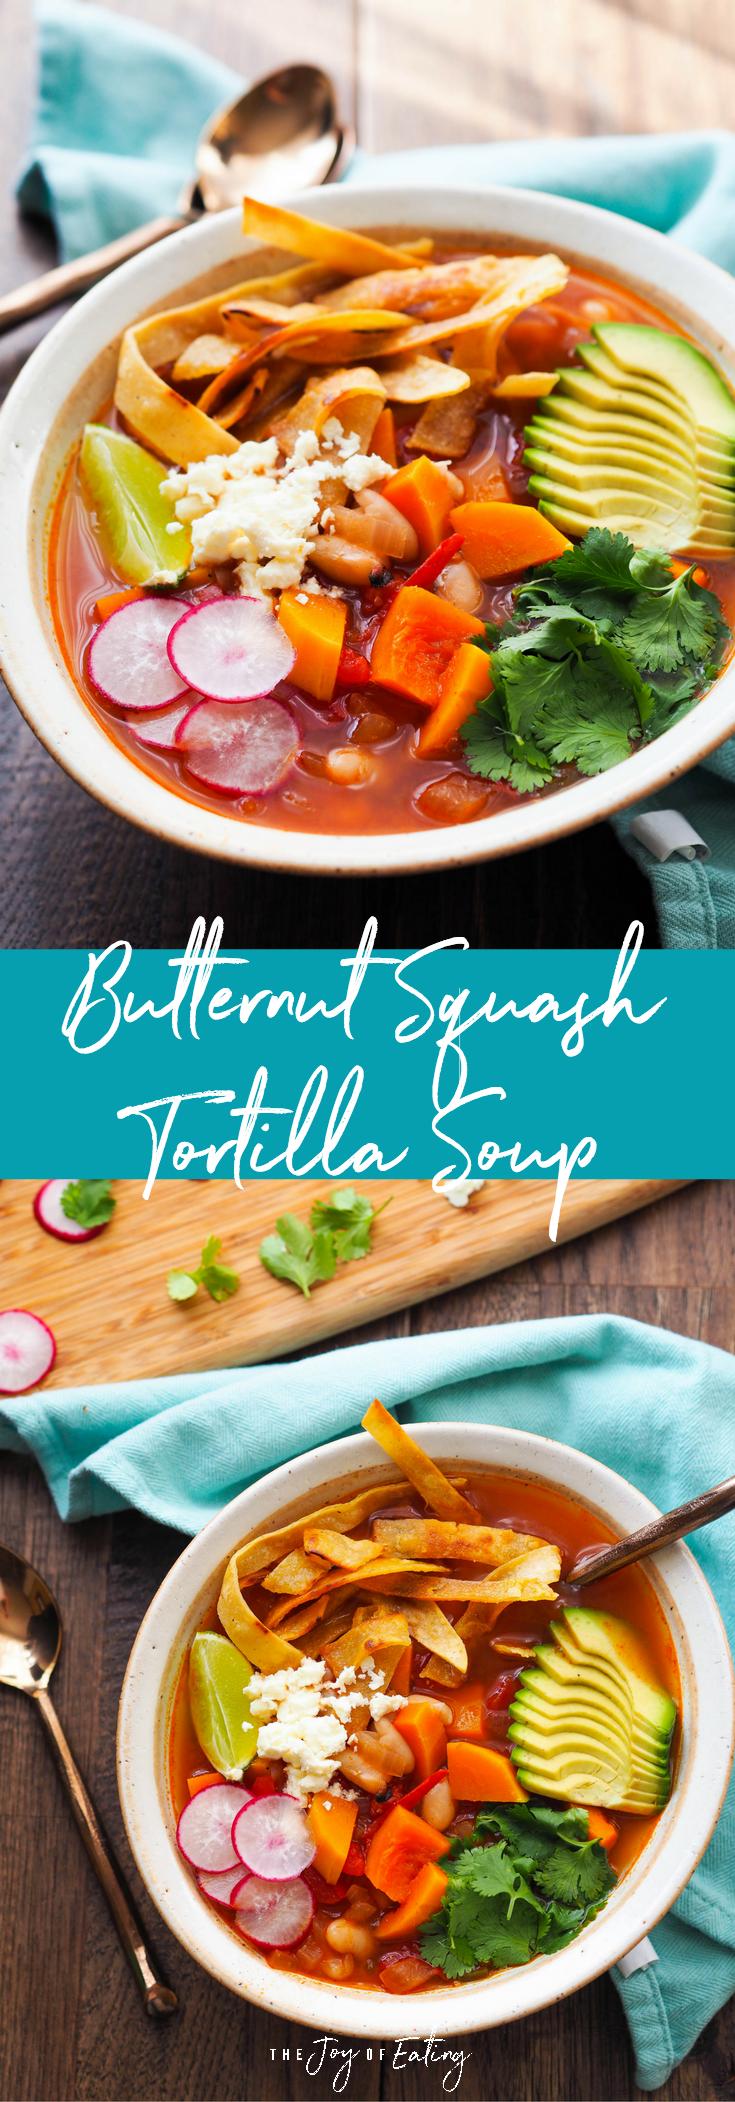 Butternut squash tortilla soup.png